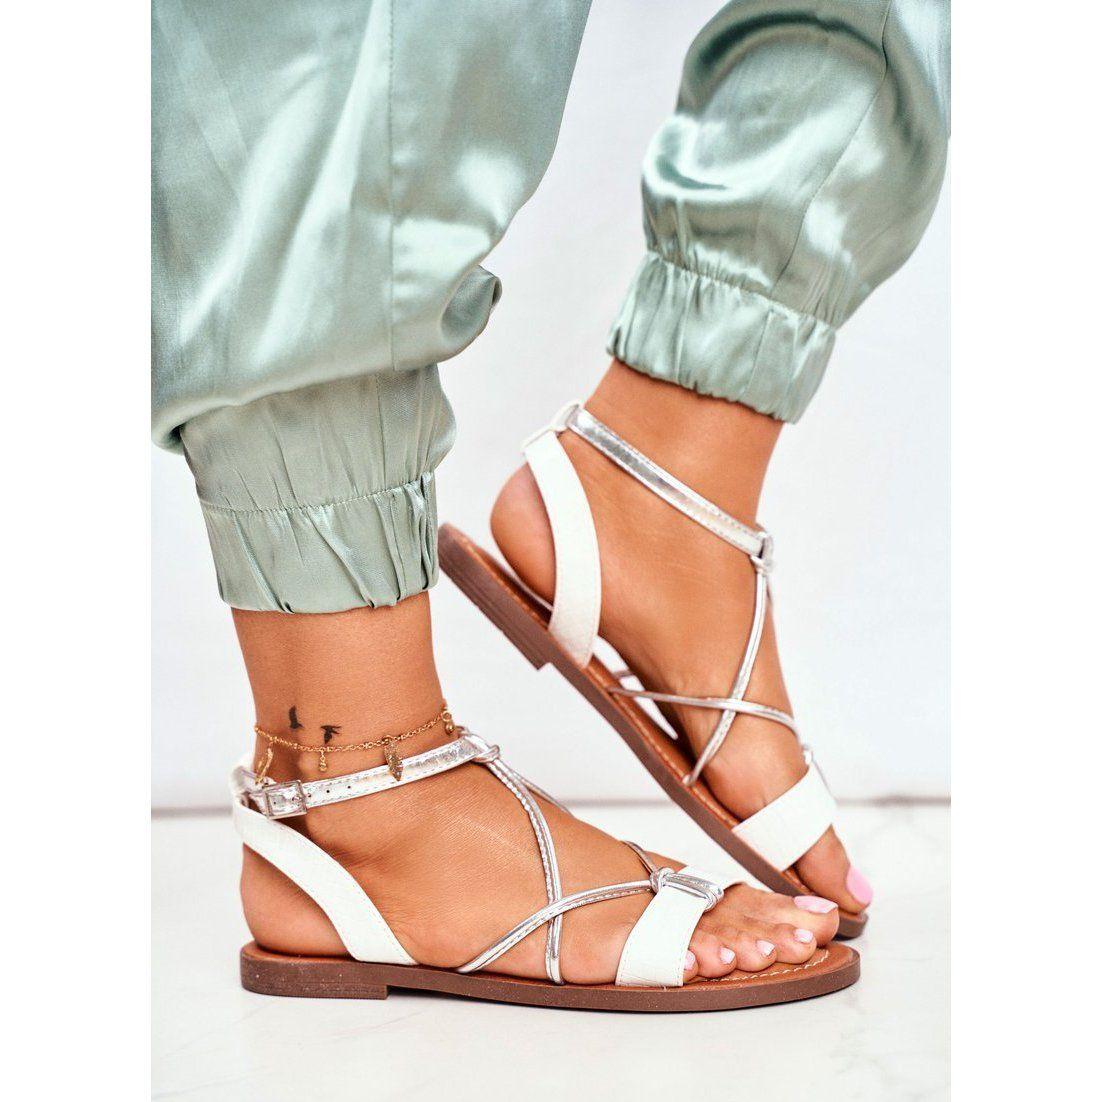 Fw1 Sandaly Damskie Plaskie Biale Alison Lace Up Flat Lace Up Shoes